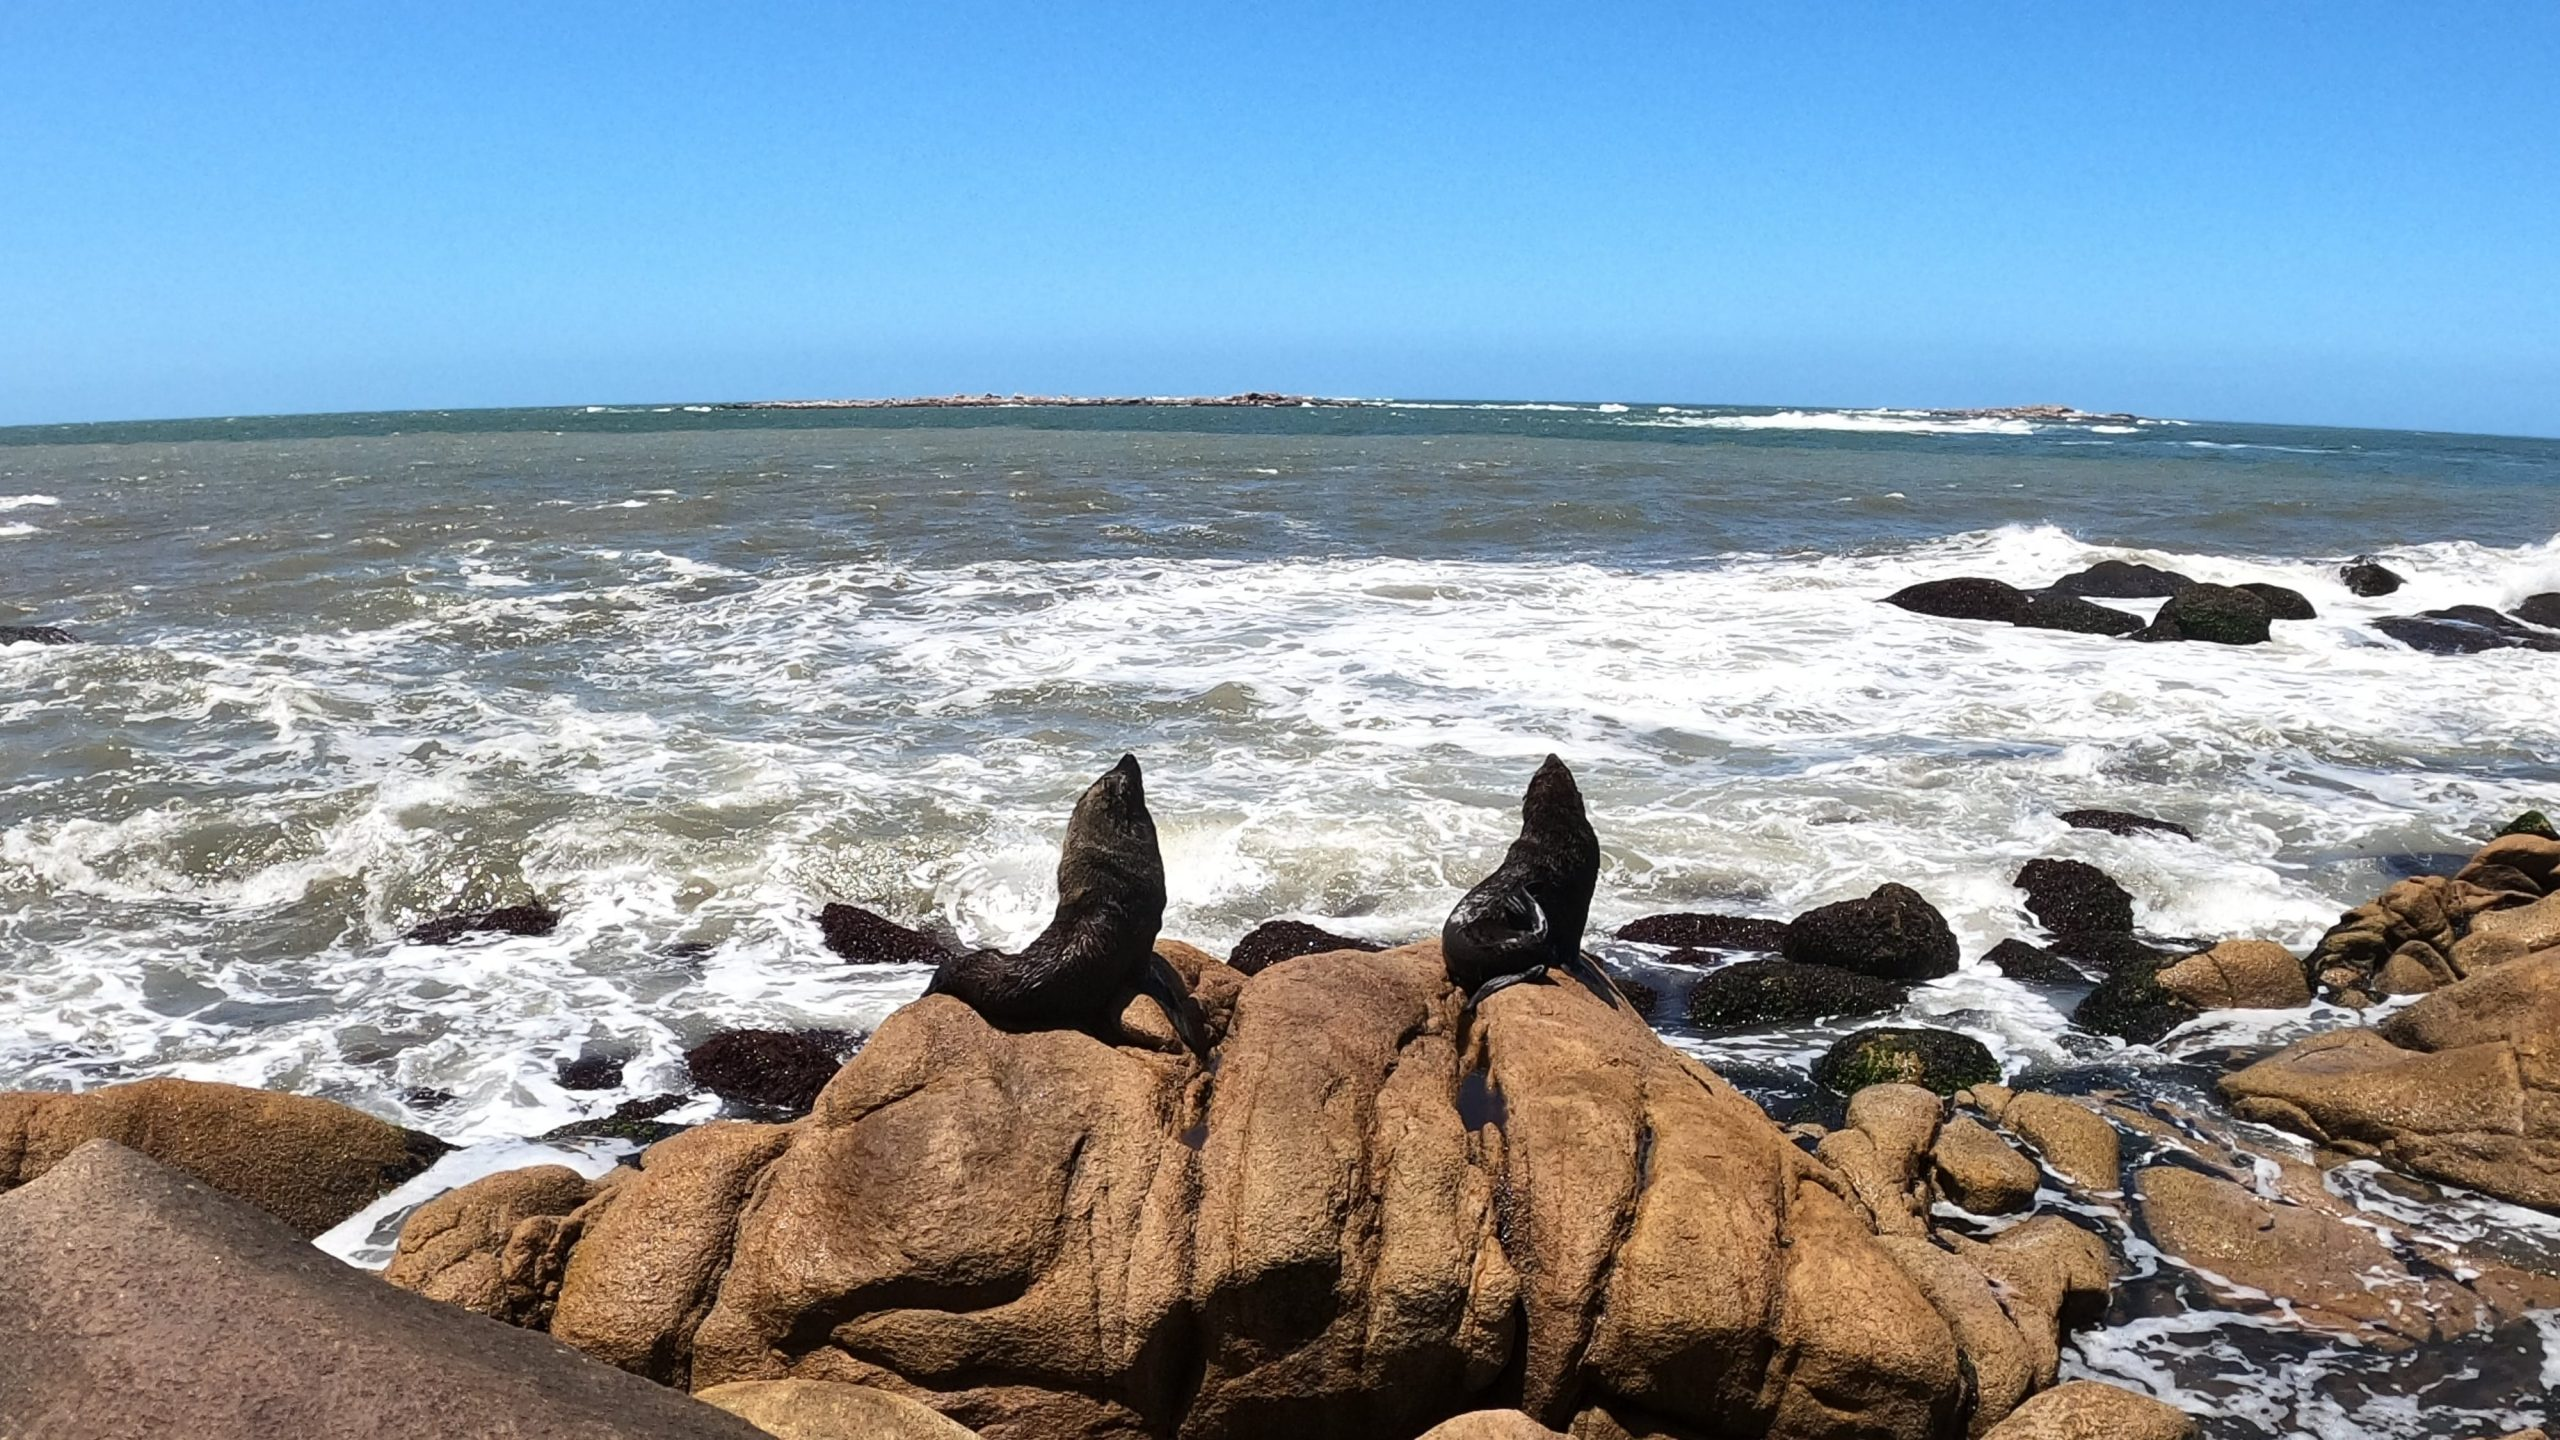 cabo polonio lupi marini